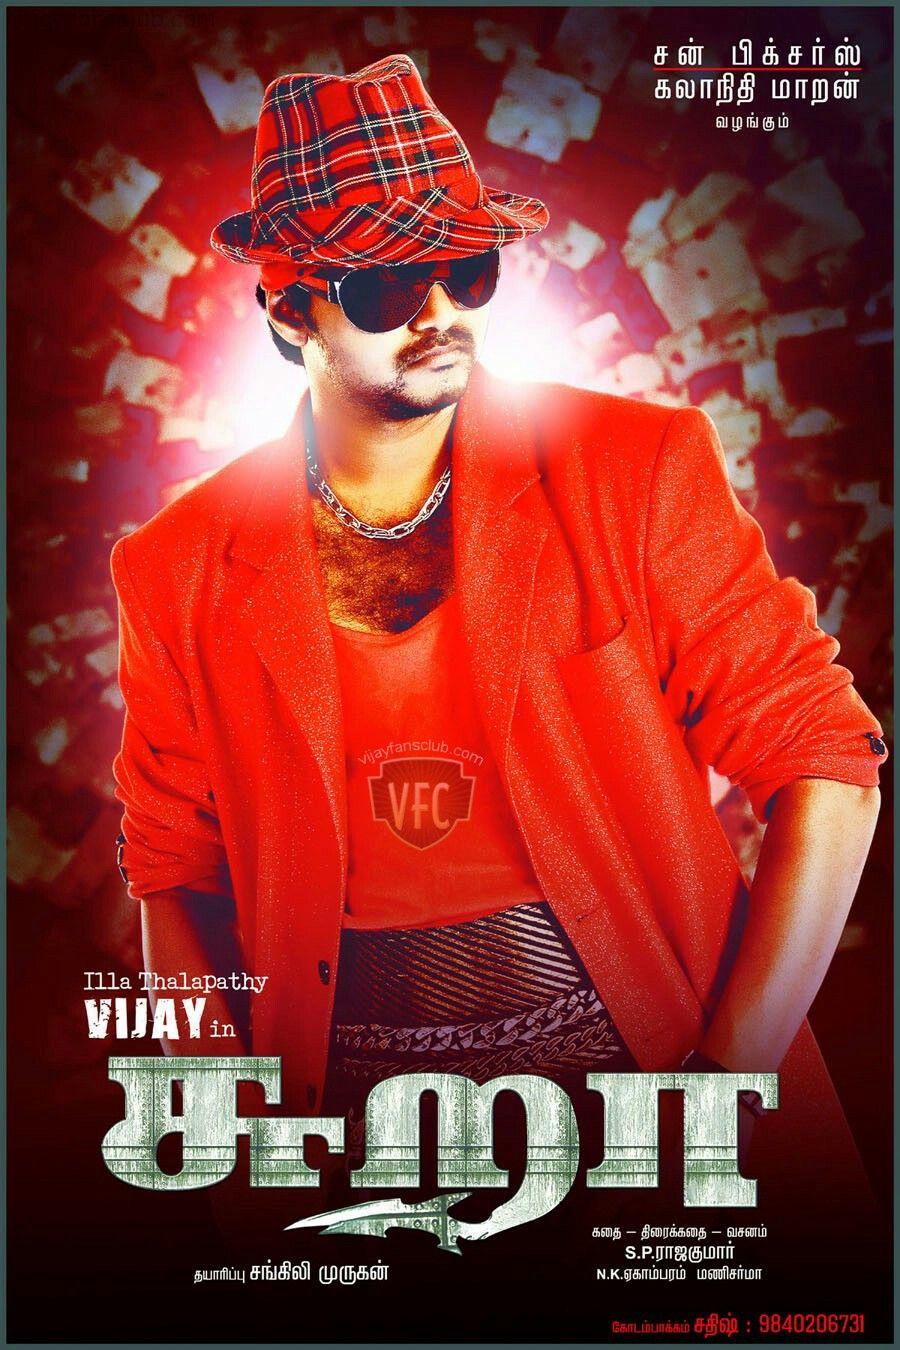 Sura Tamil Movie Credit Vijay Fans Club Tamil Movies Online Hd Movies Download Tamil Video Songs